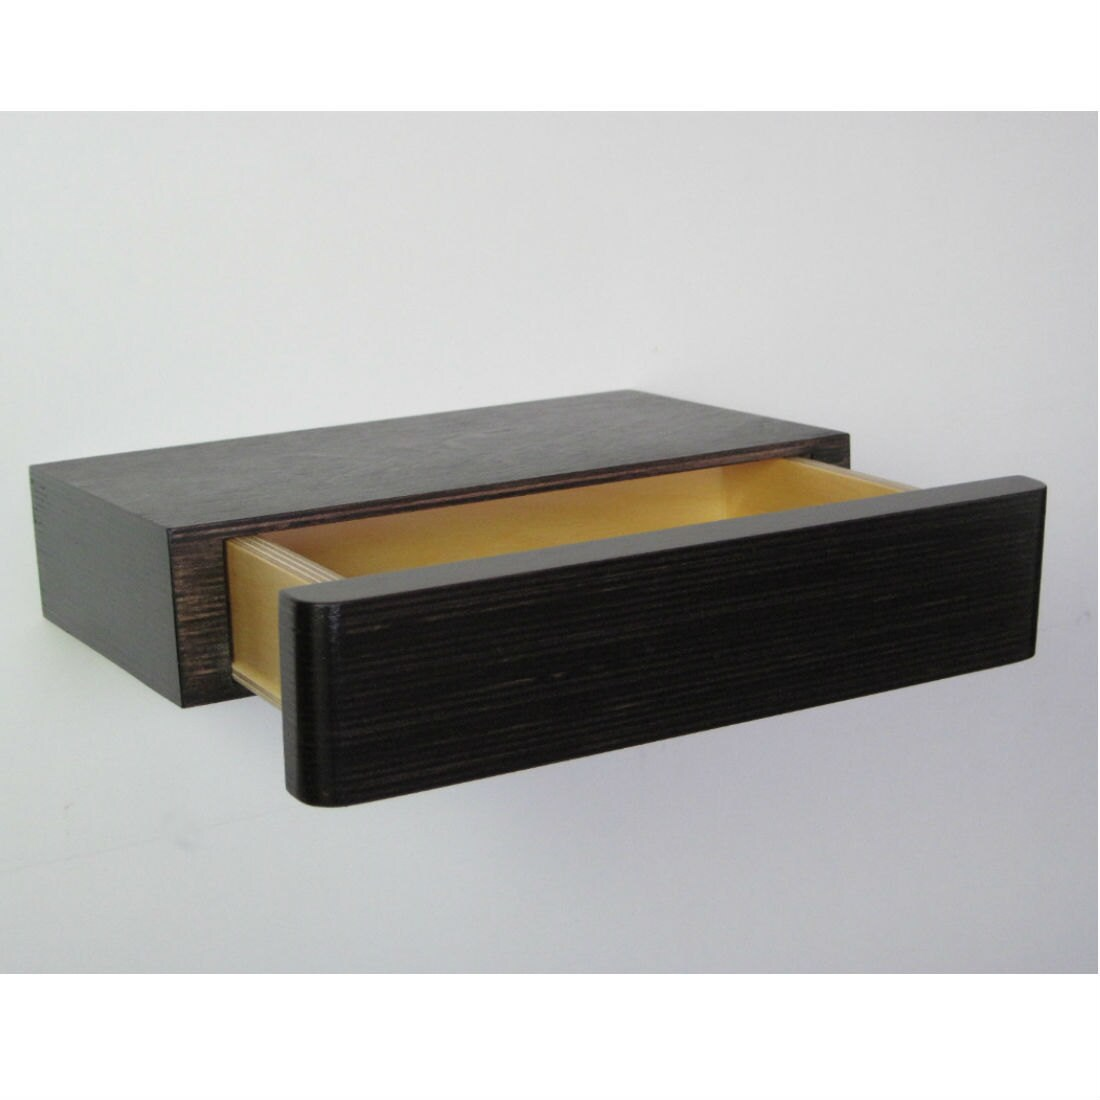 Pacco Floating Drawer In Dark Walnut Stain